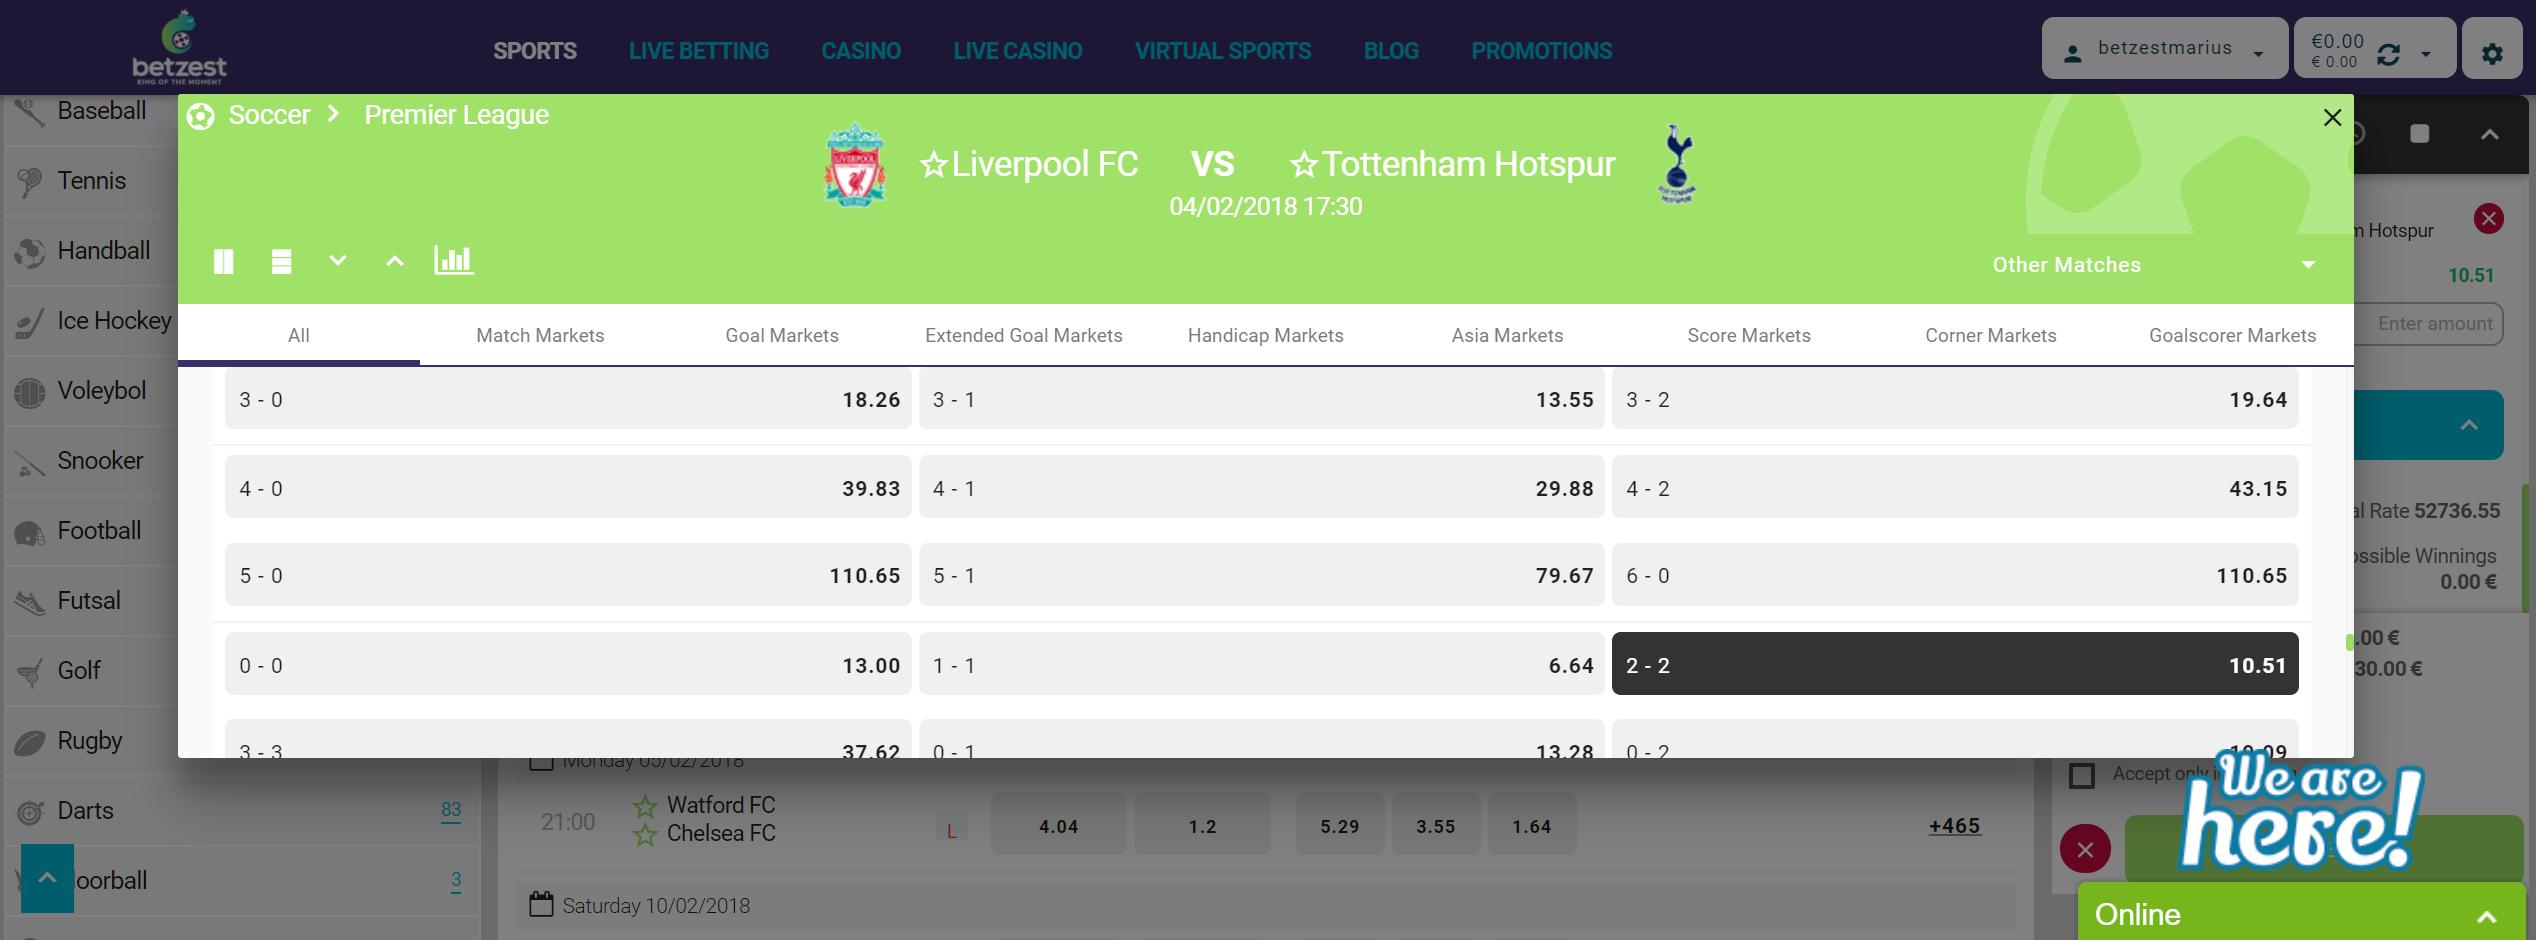 Liverpool vs Tottenham Betzest odds